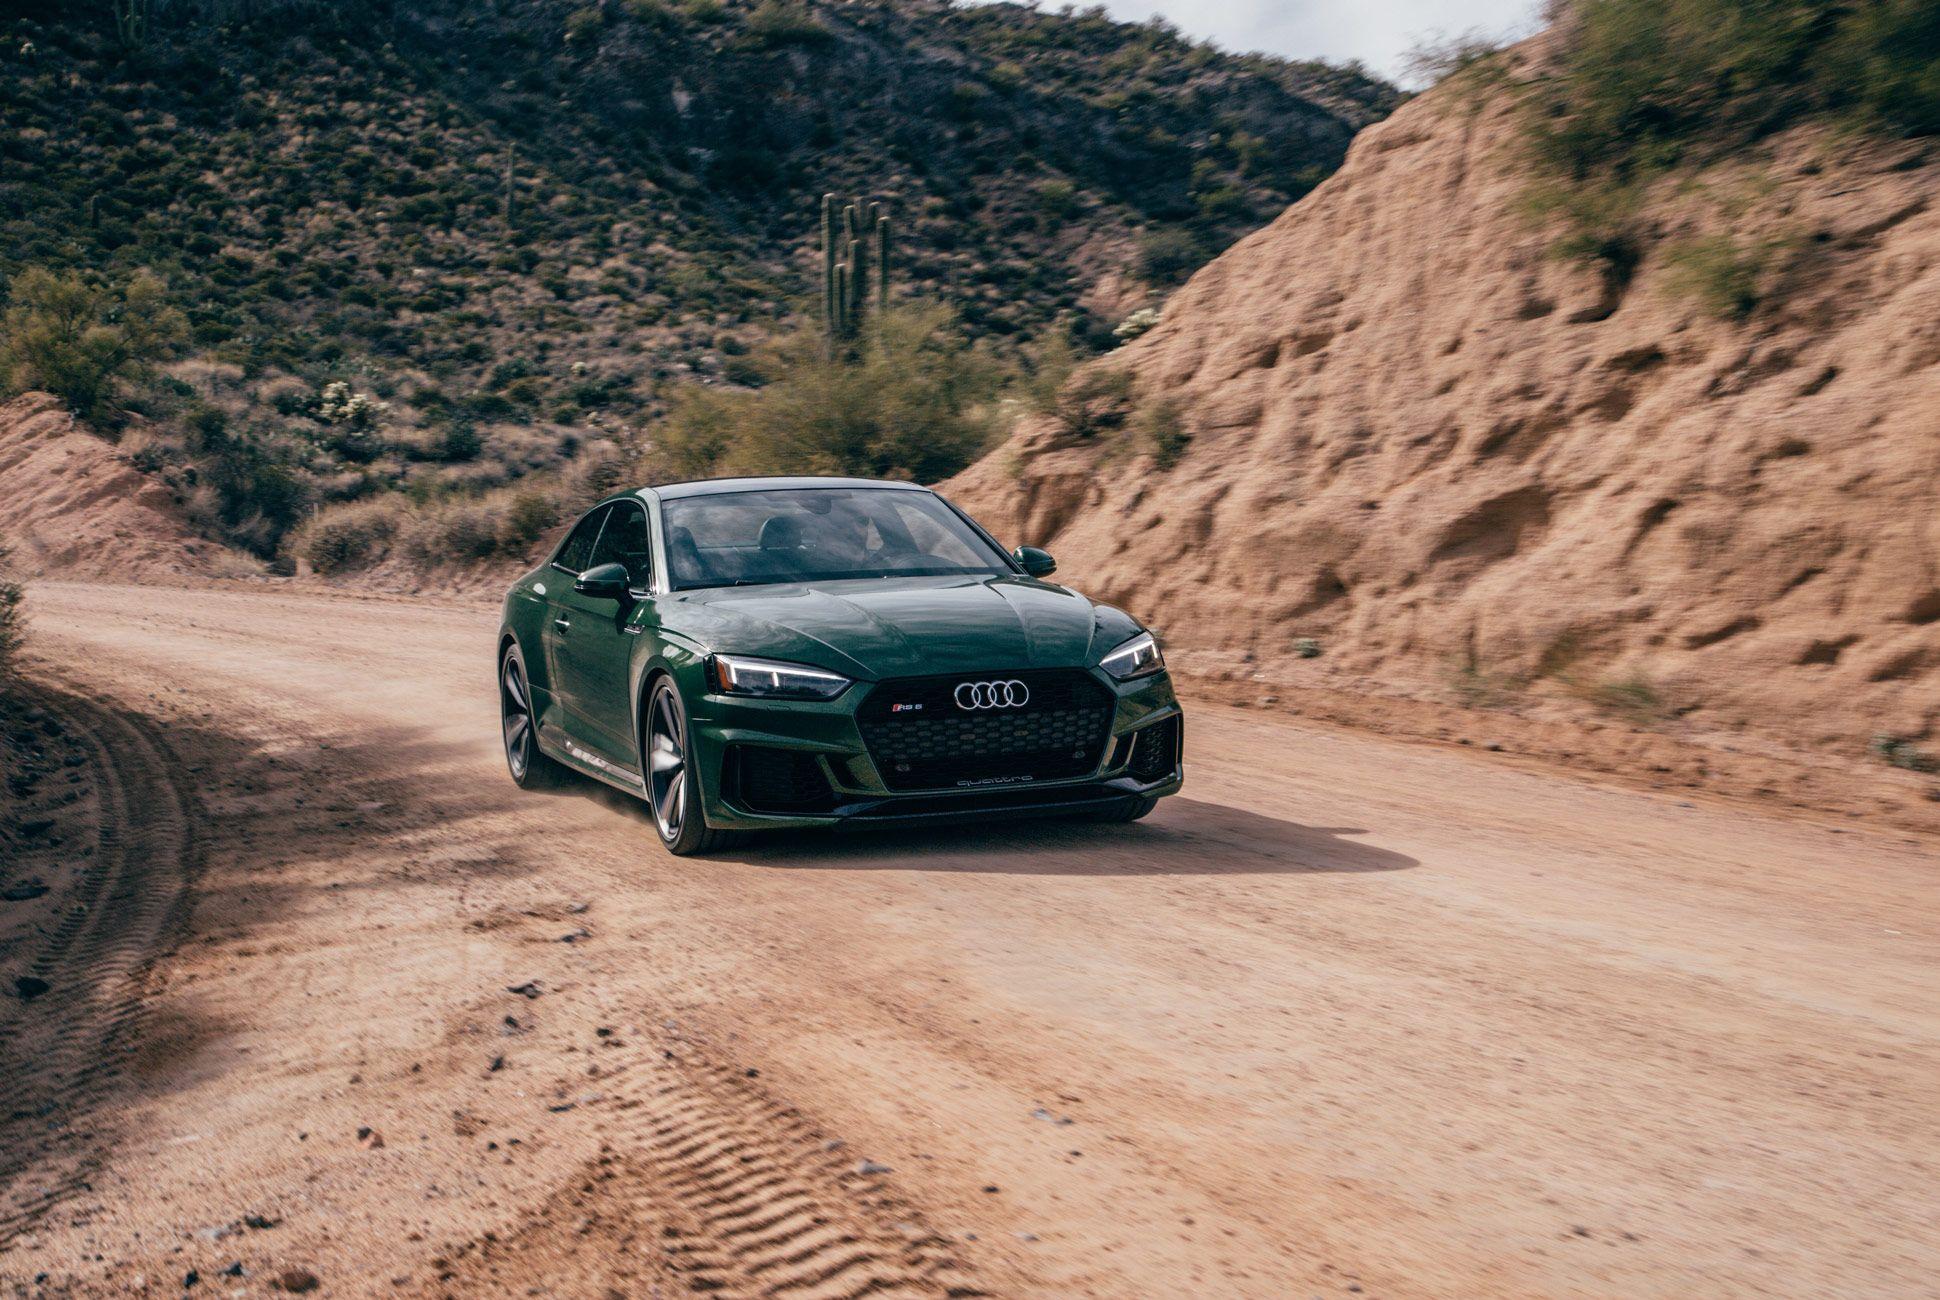 Audi-RS5-Gear-Patrol-Slide-7